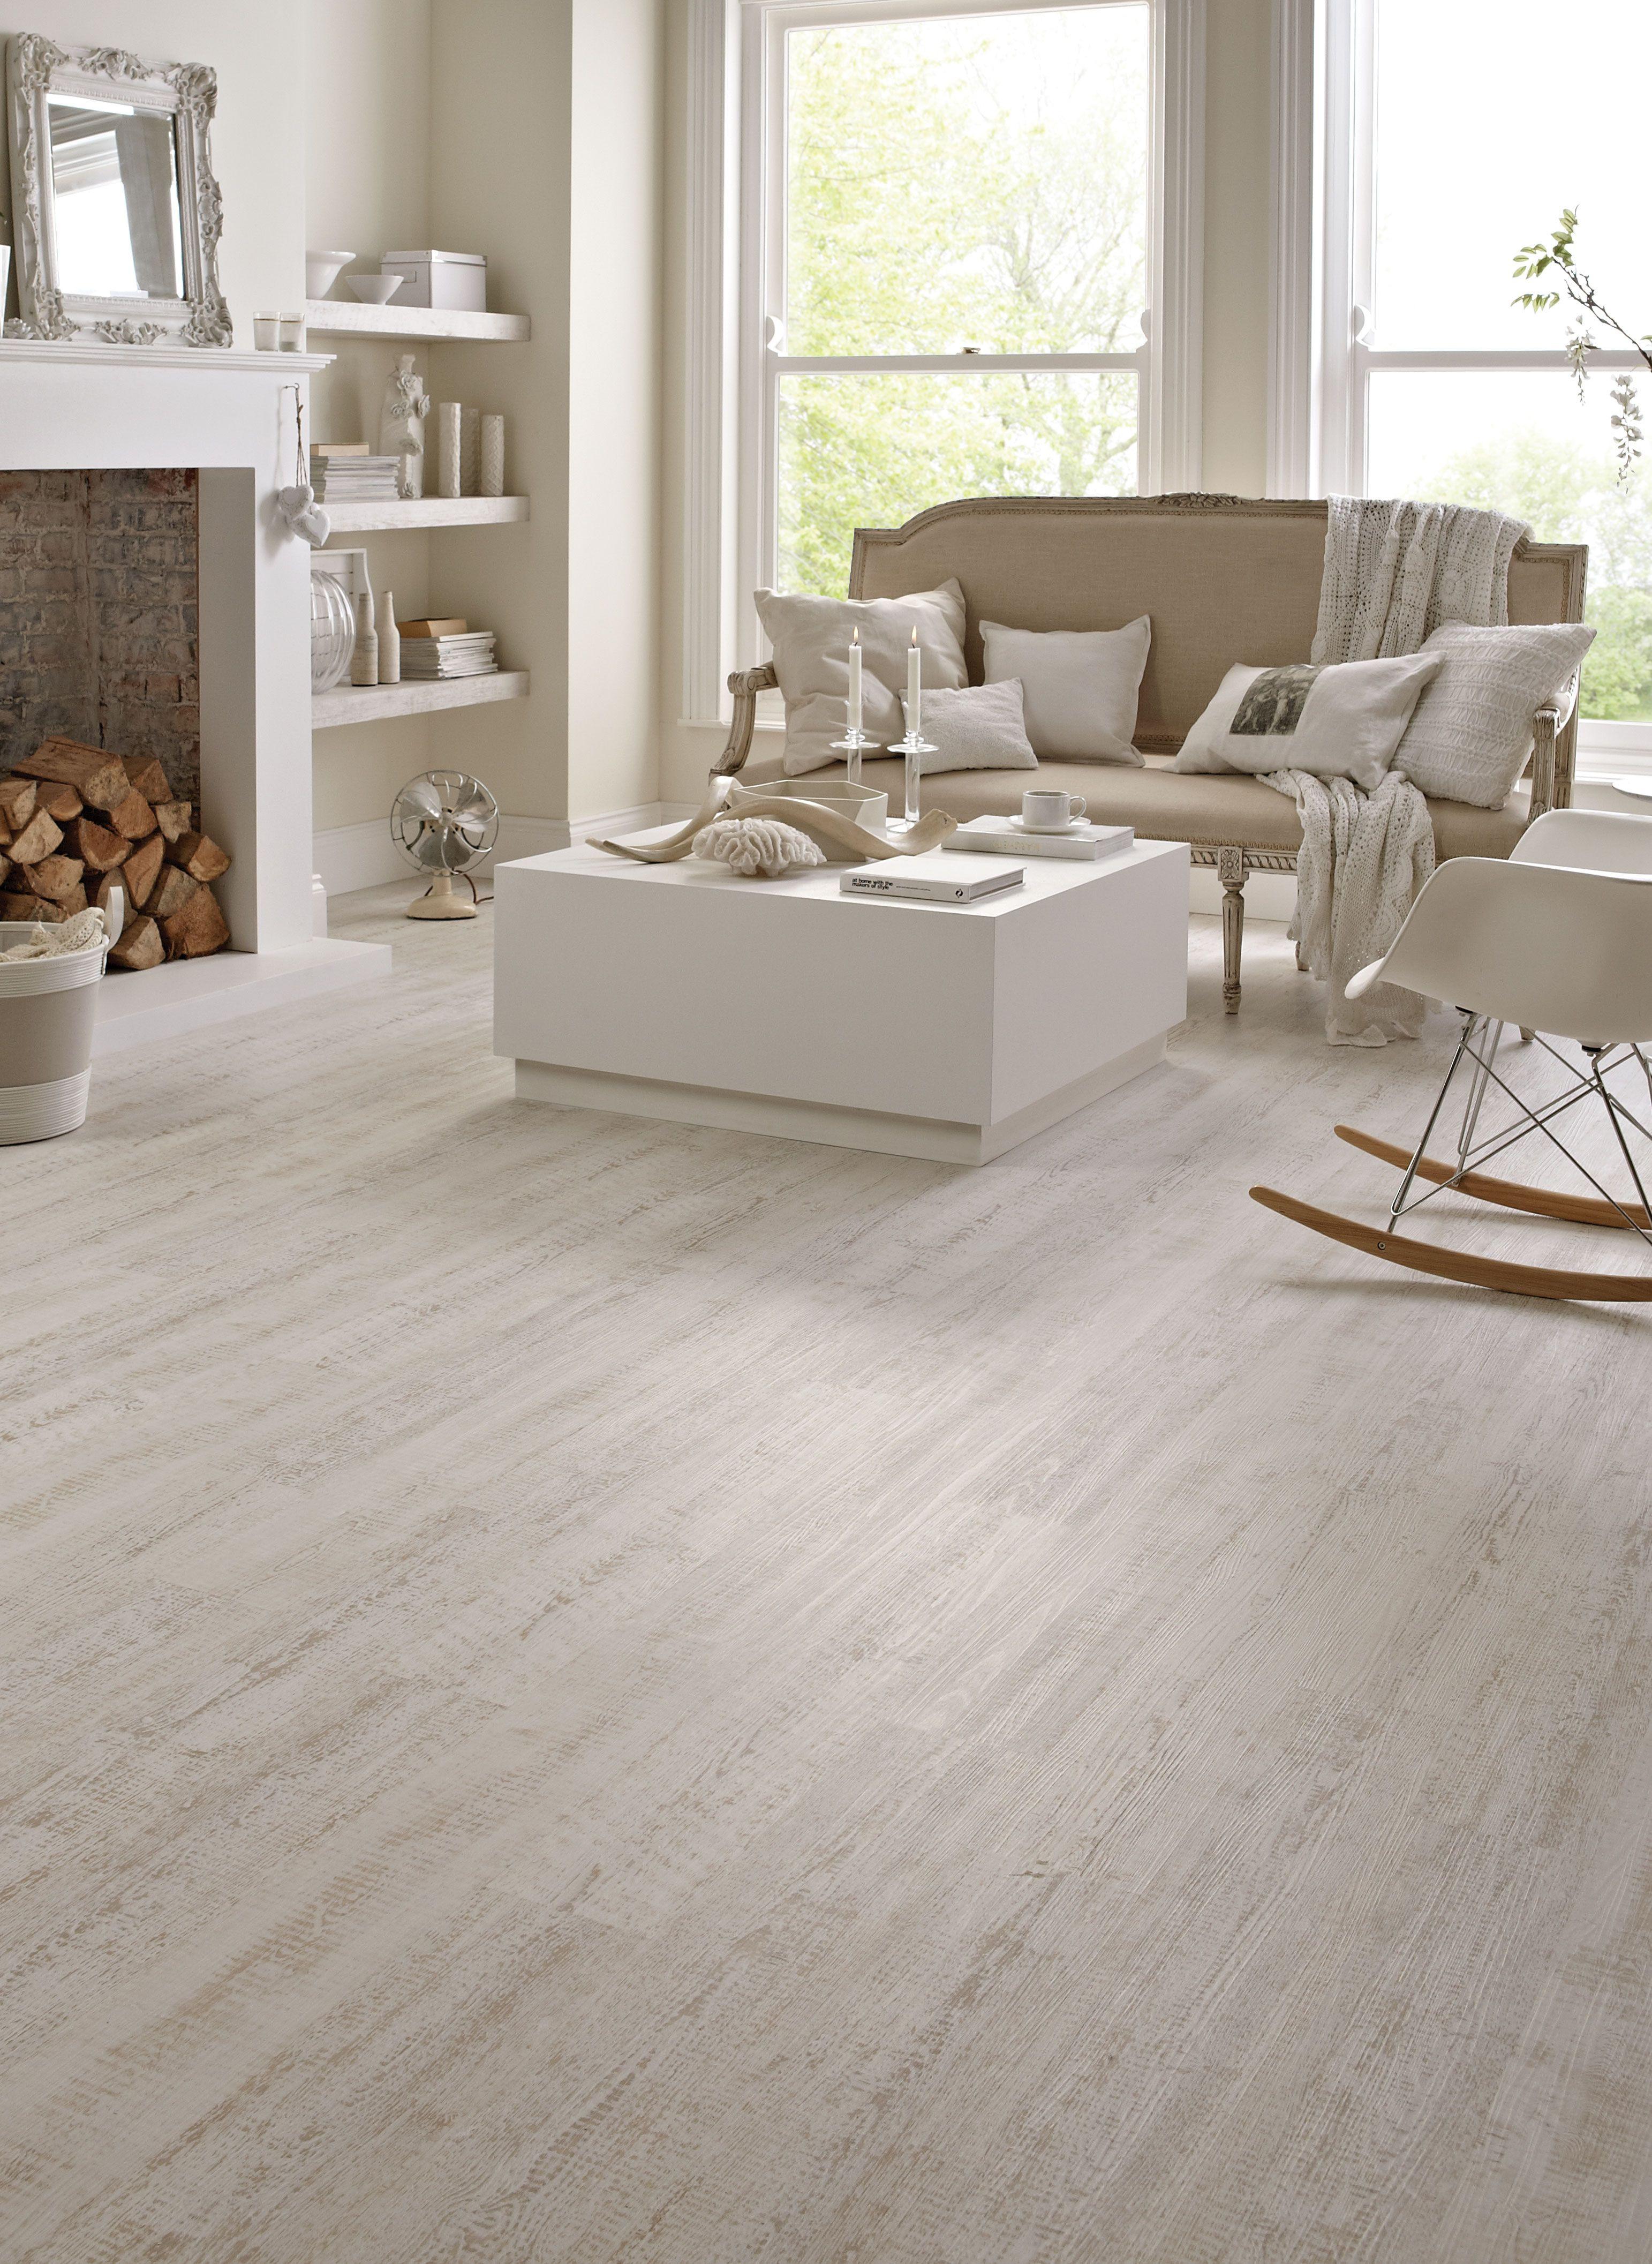 Ark Hardwood Flooring Of Flooring Definition 12 Laminate Flooring for Kitchen Backsplash with Regard to Flooring Definition Karndean Wood Flooring White Painted Oak by Karndeanfloors